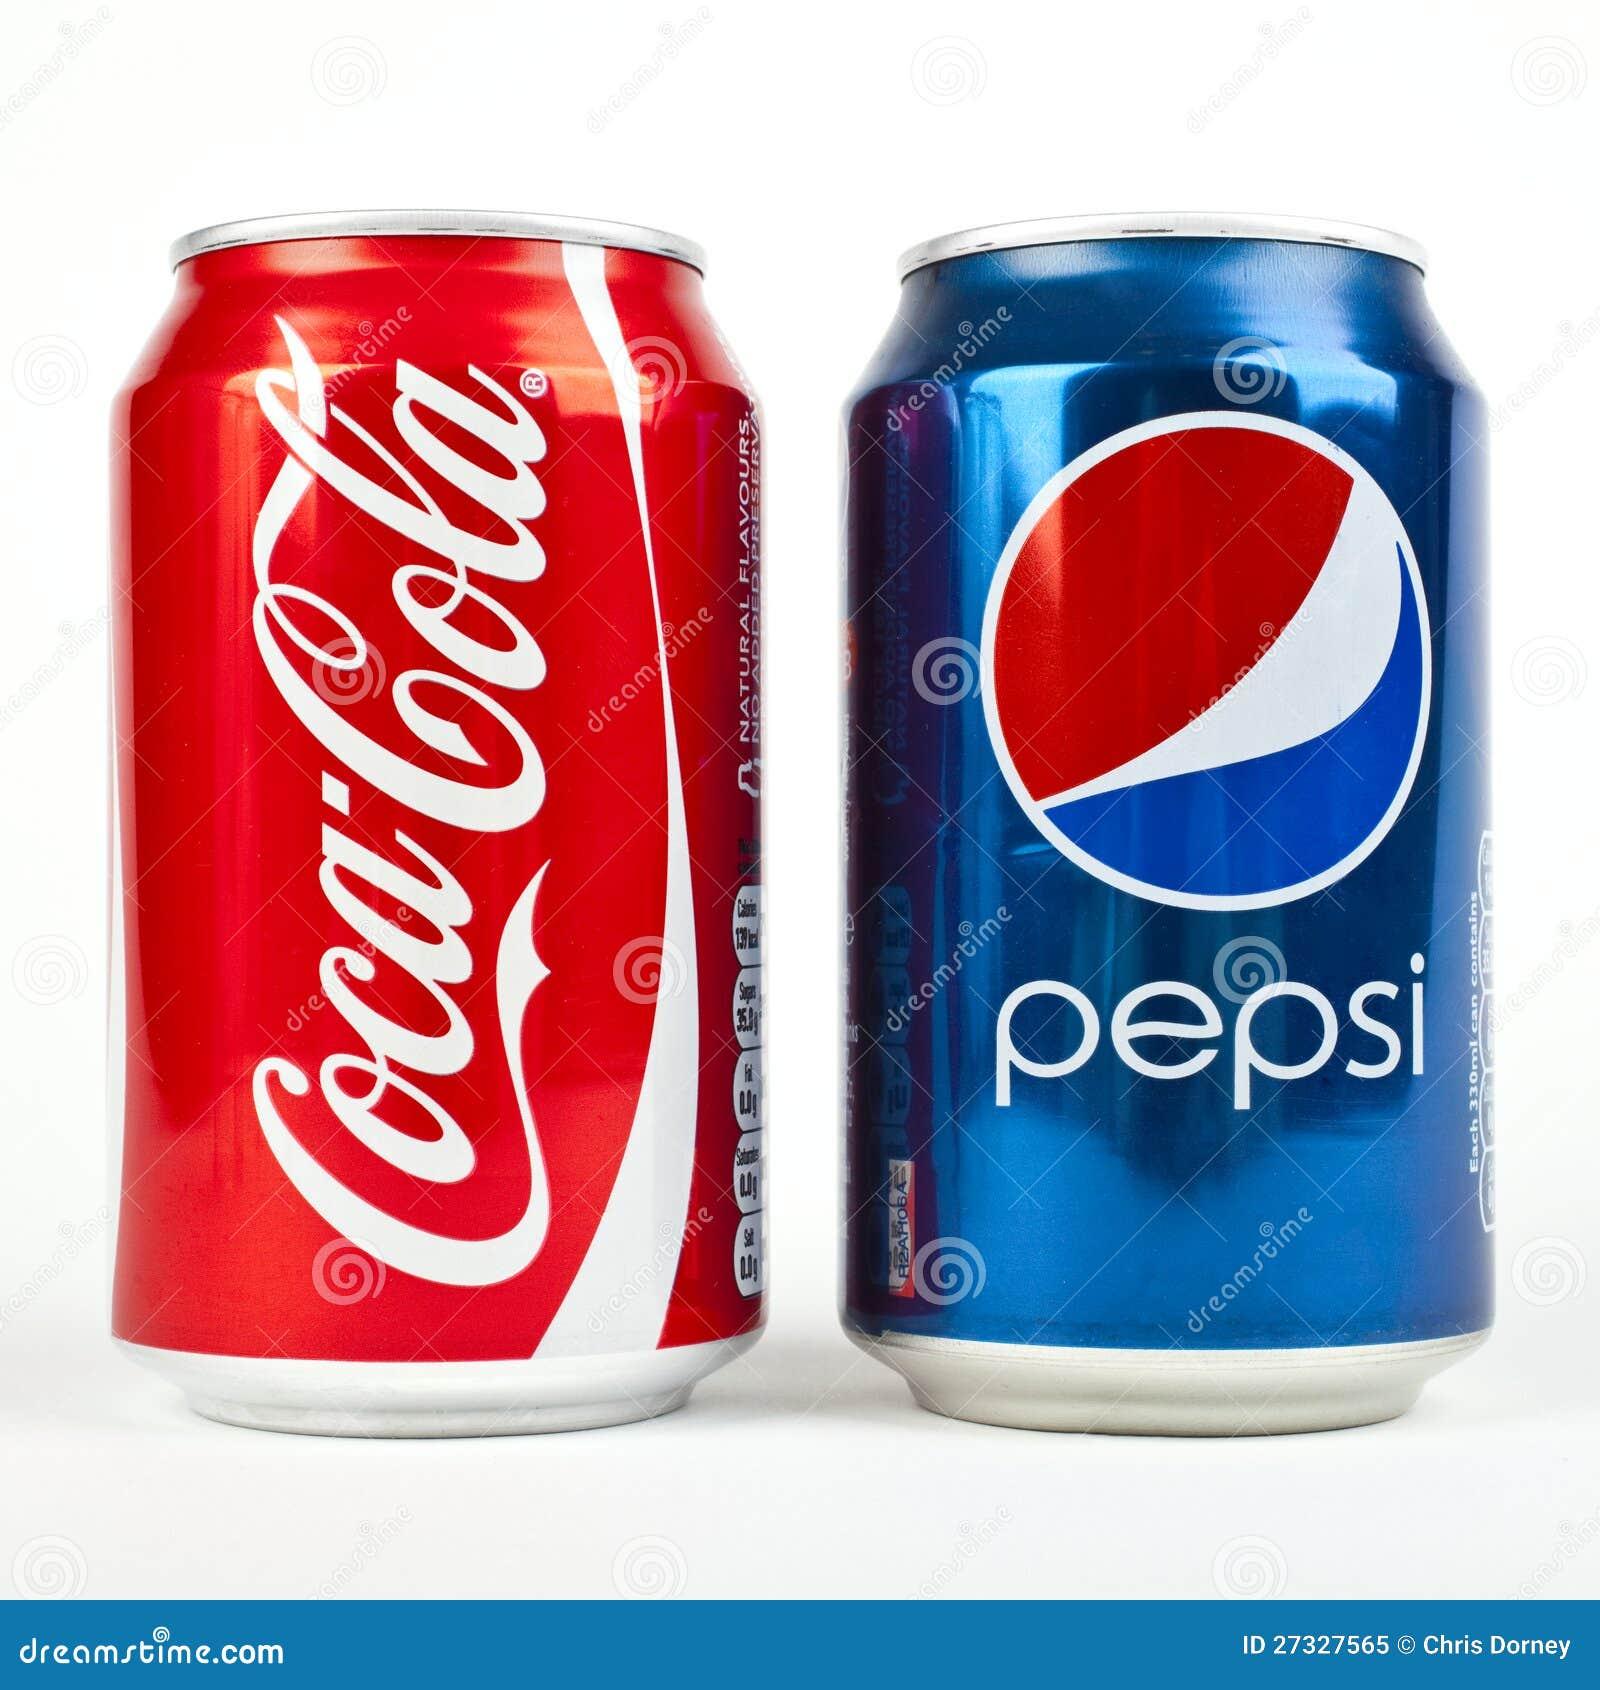 coca cola gegen pepsi redaktionelles bild bild 27327565. Black Bedroom Furniture Sets. Home Design Ideas